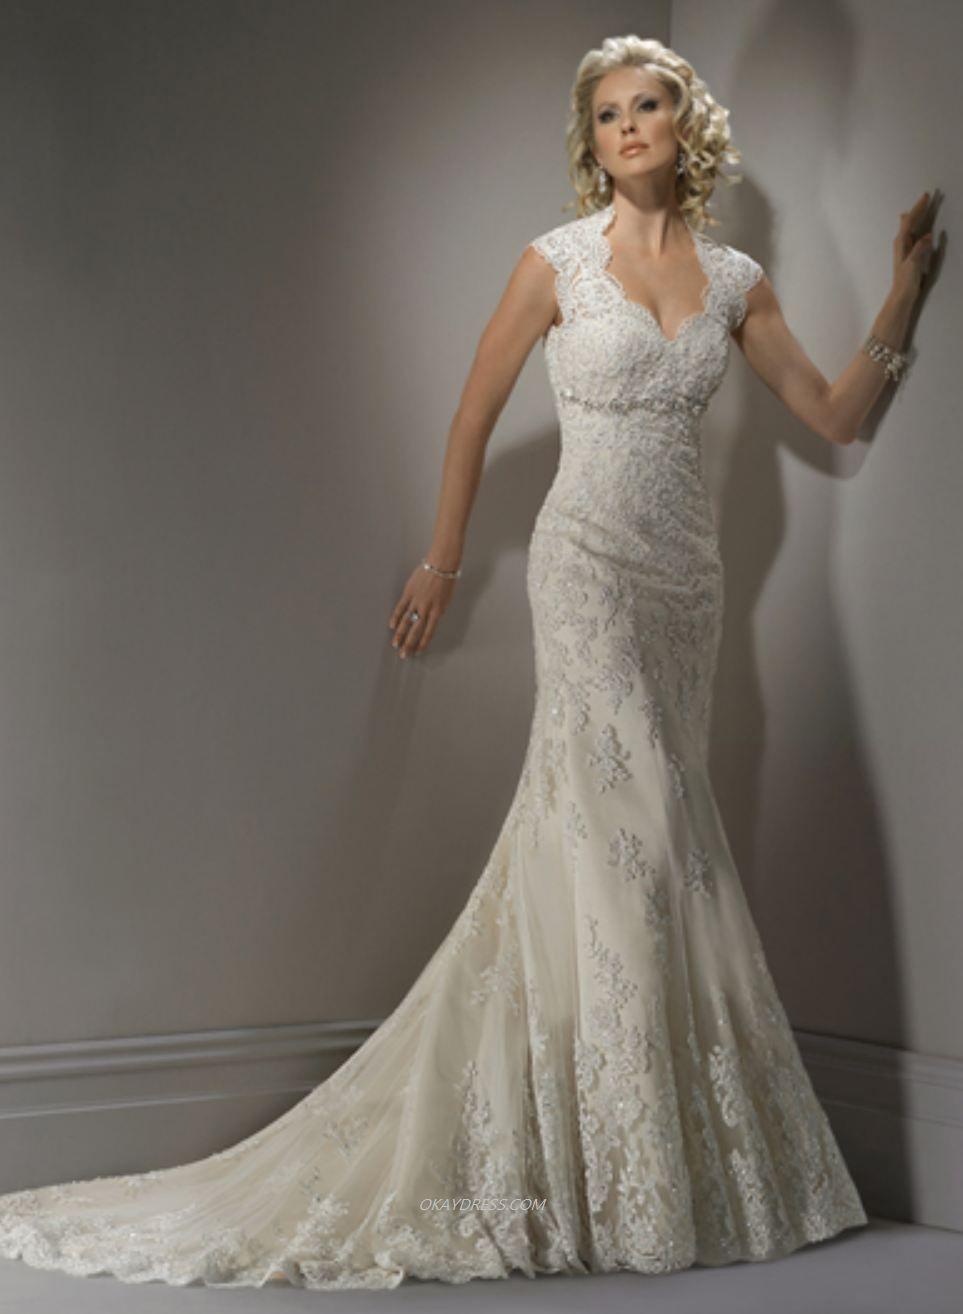 Maggie Sottero Bernadette Bridal Gown (2011) | Sil\'s wedding ideas ...